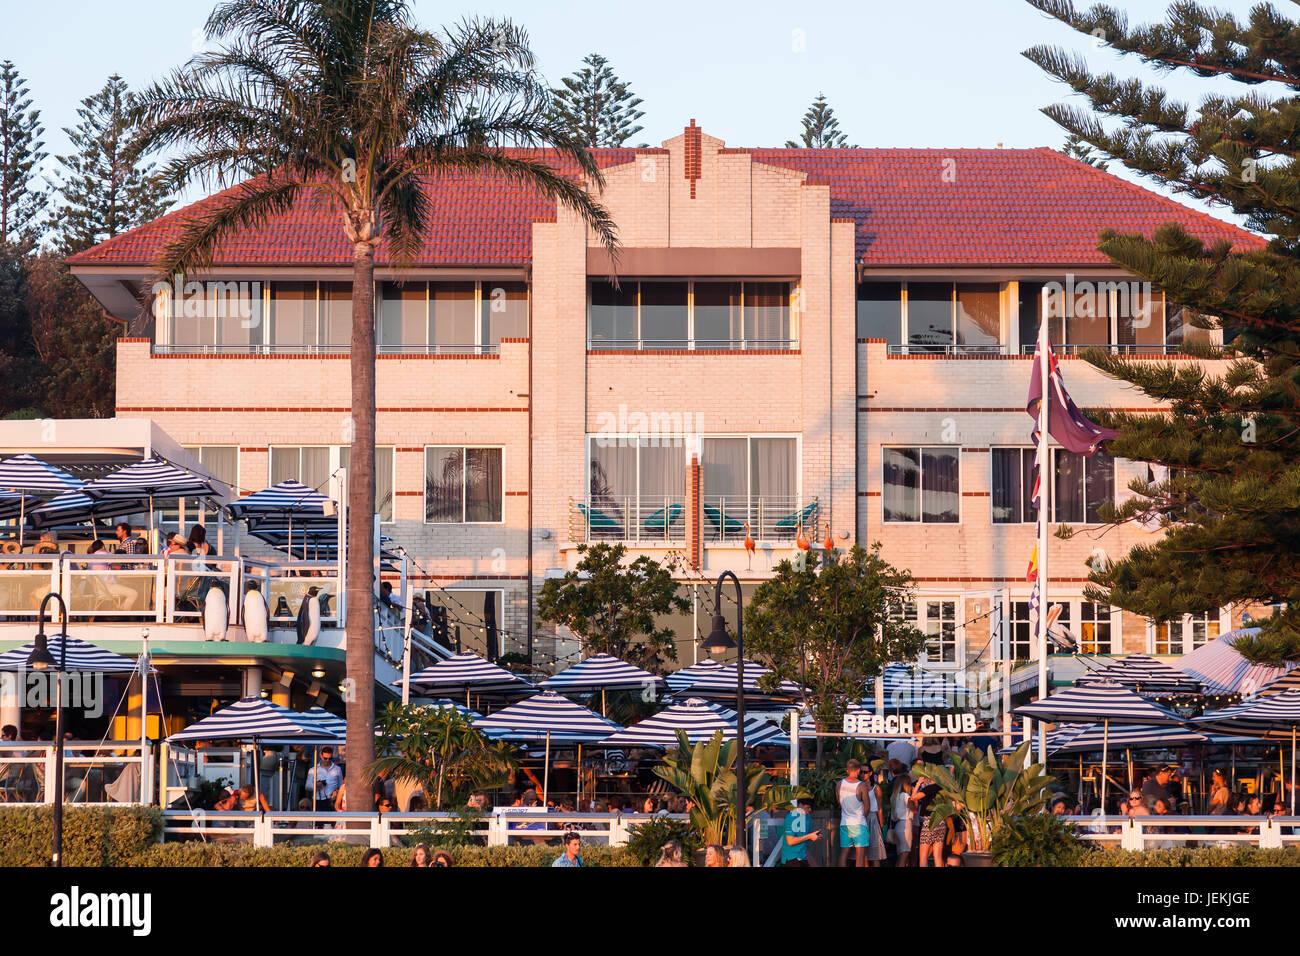 Watsons Bay Boutique Hotel, Sydney, Australia. - Stock Image